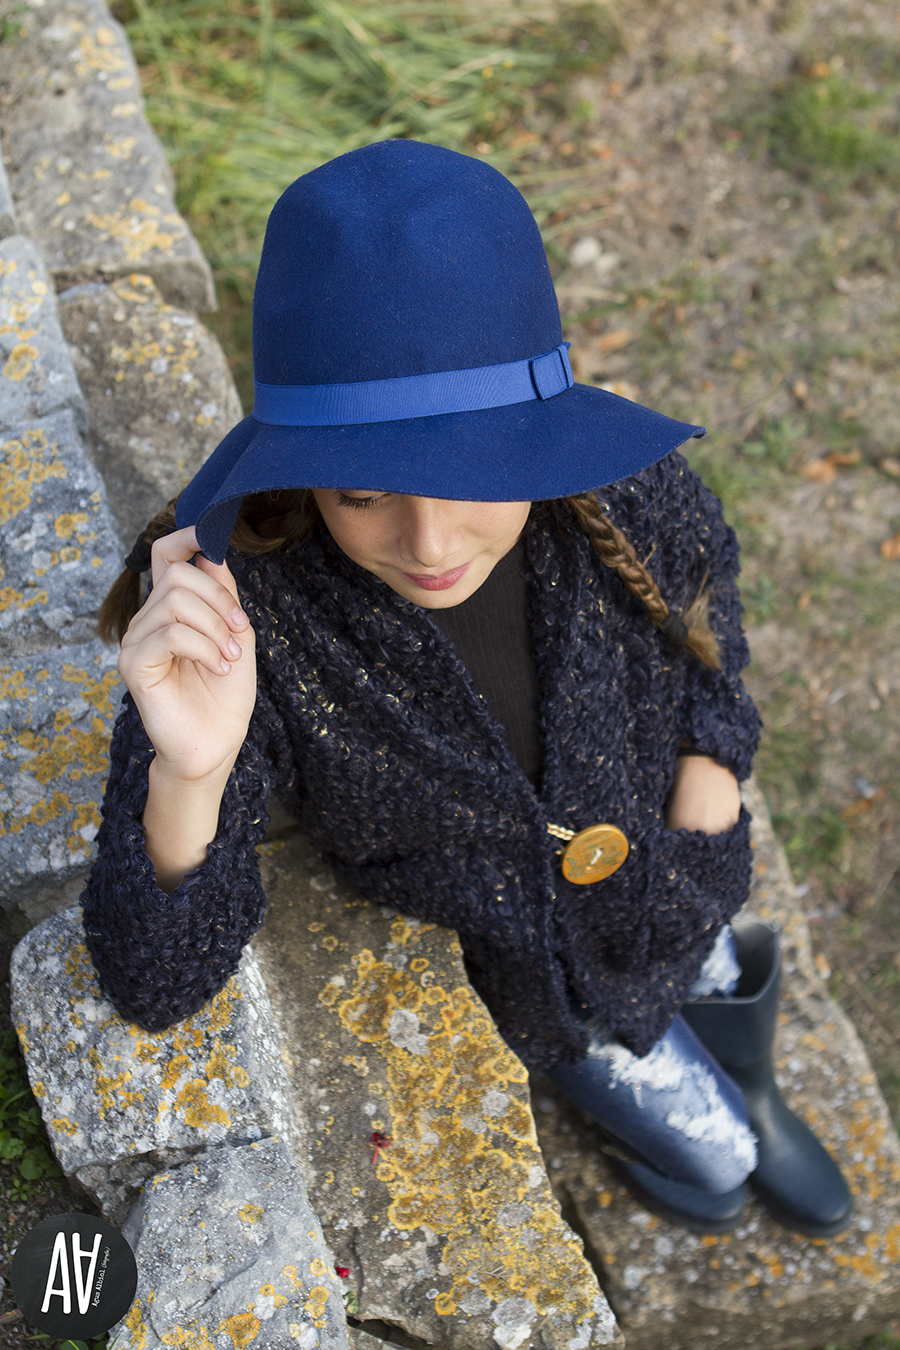 Agus Albiol Fotografia fotografa de moda street style trends & fashion mini Barcelona Elisabeth Puig ropa niños.9